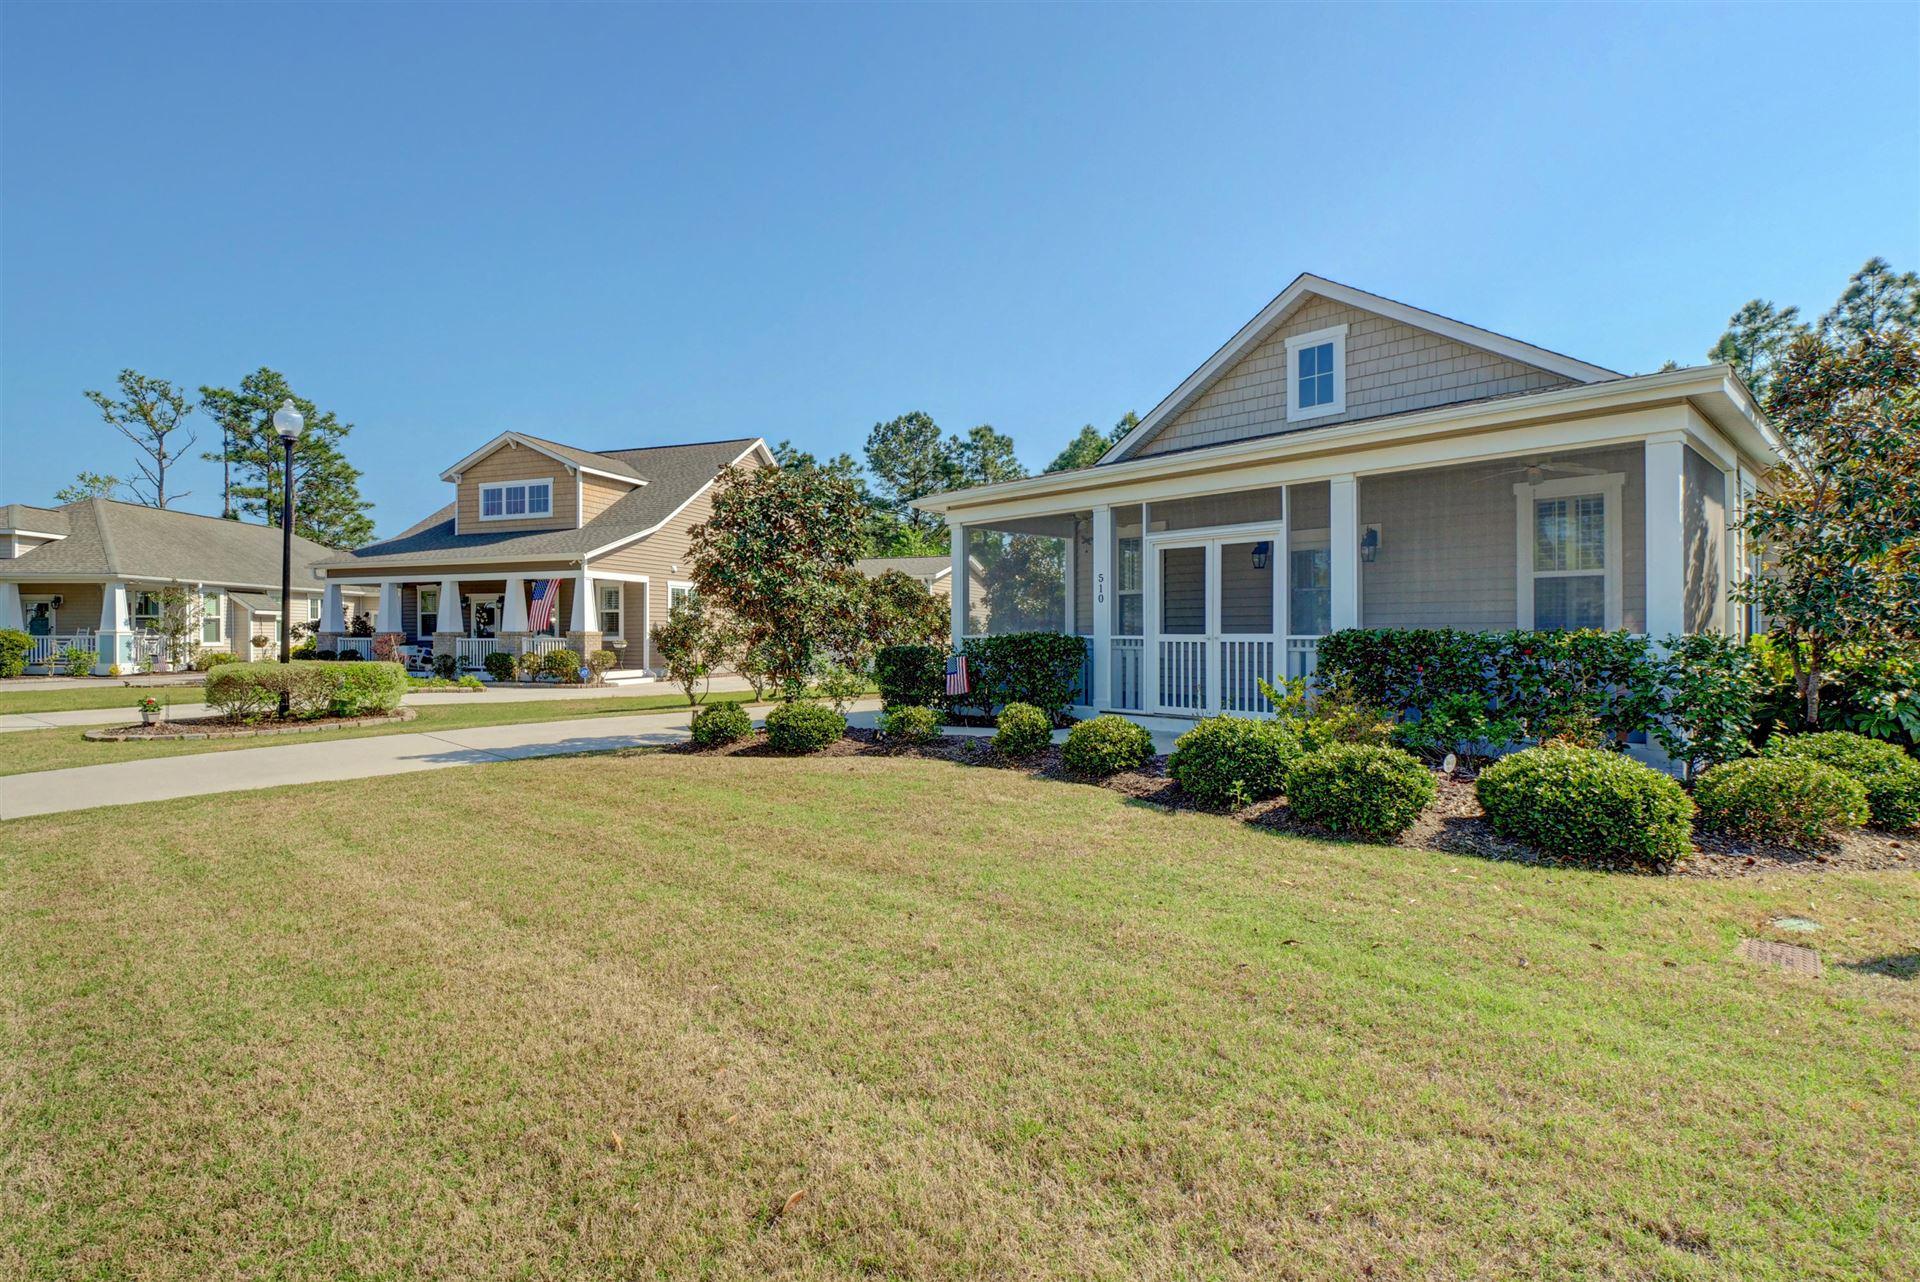 Photo of 510 Cottage Court, Holly Ridge, NC 28445 (MLS # 100268777)